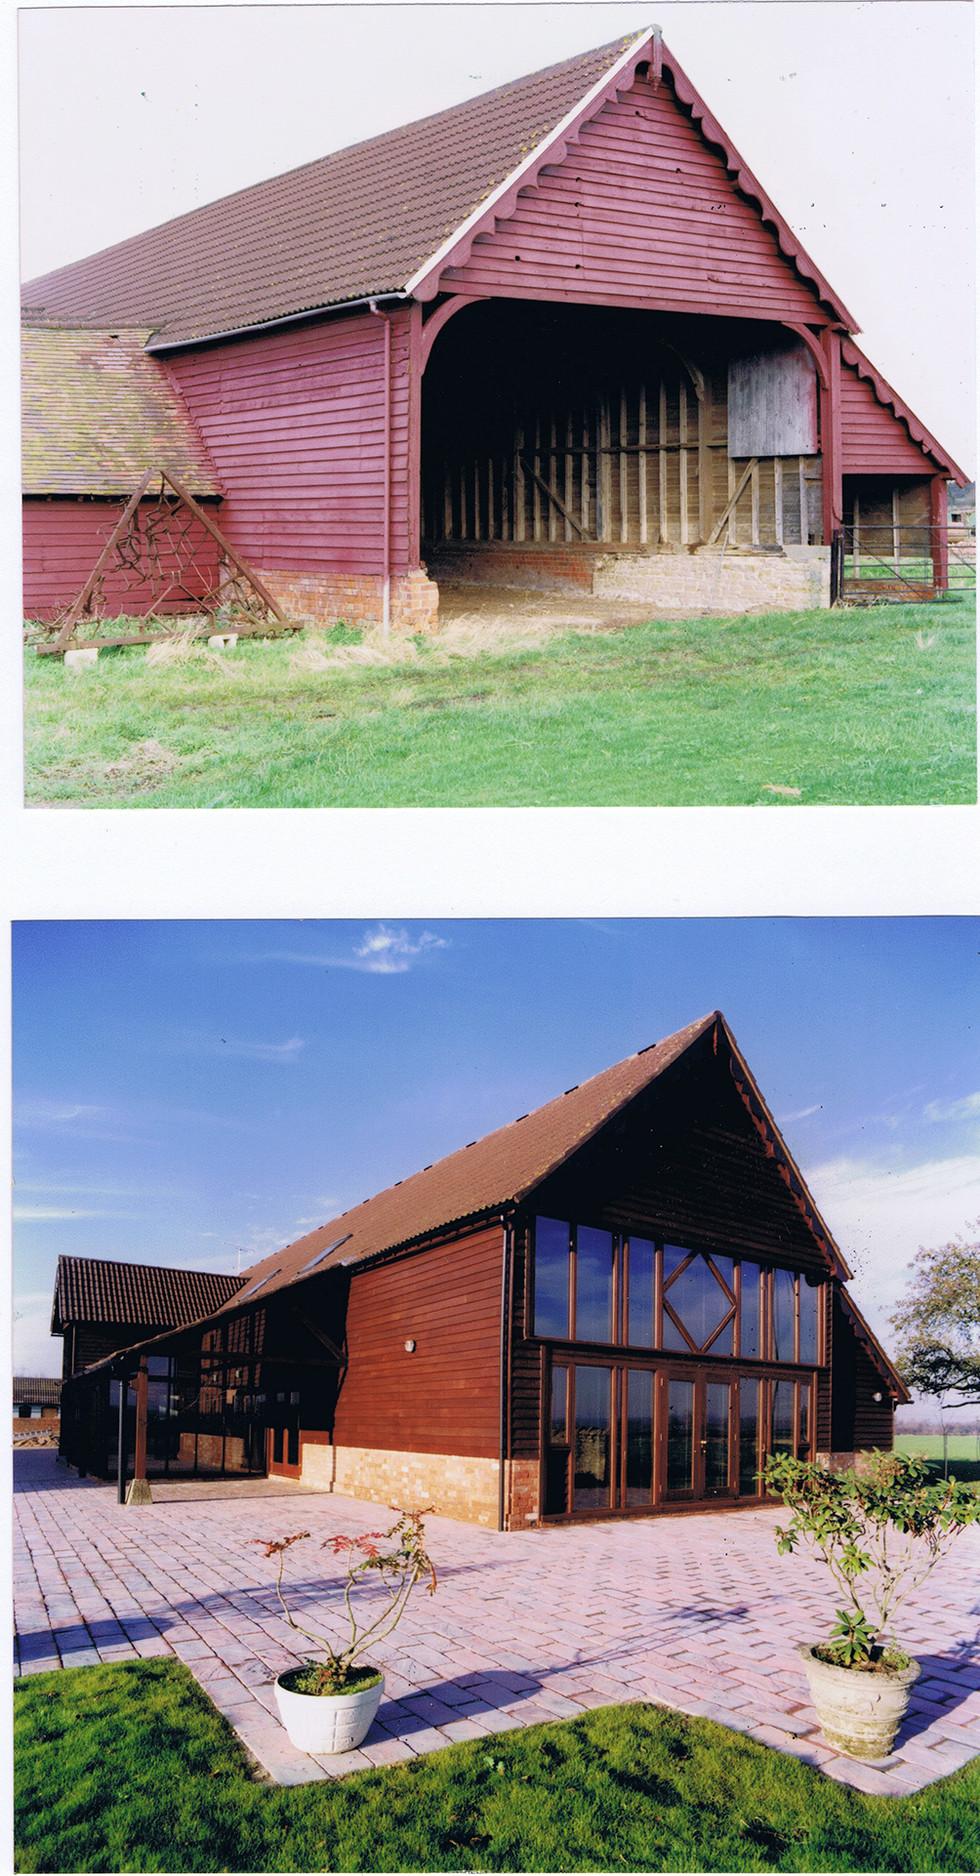 Tibberton eco-barn.1990